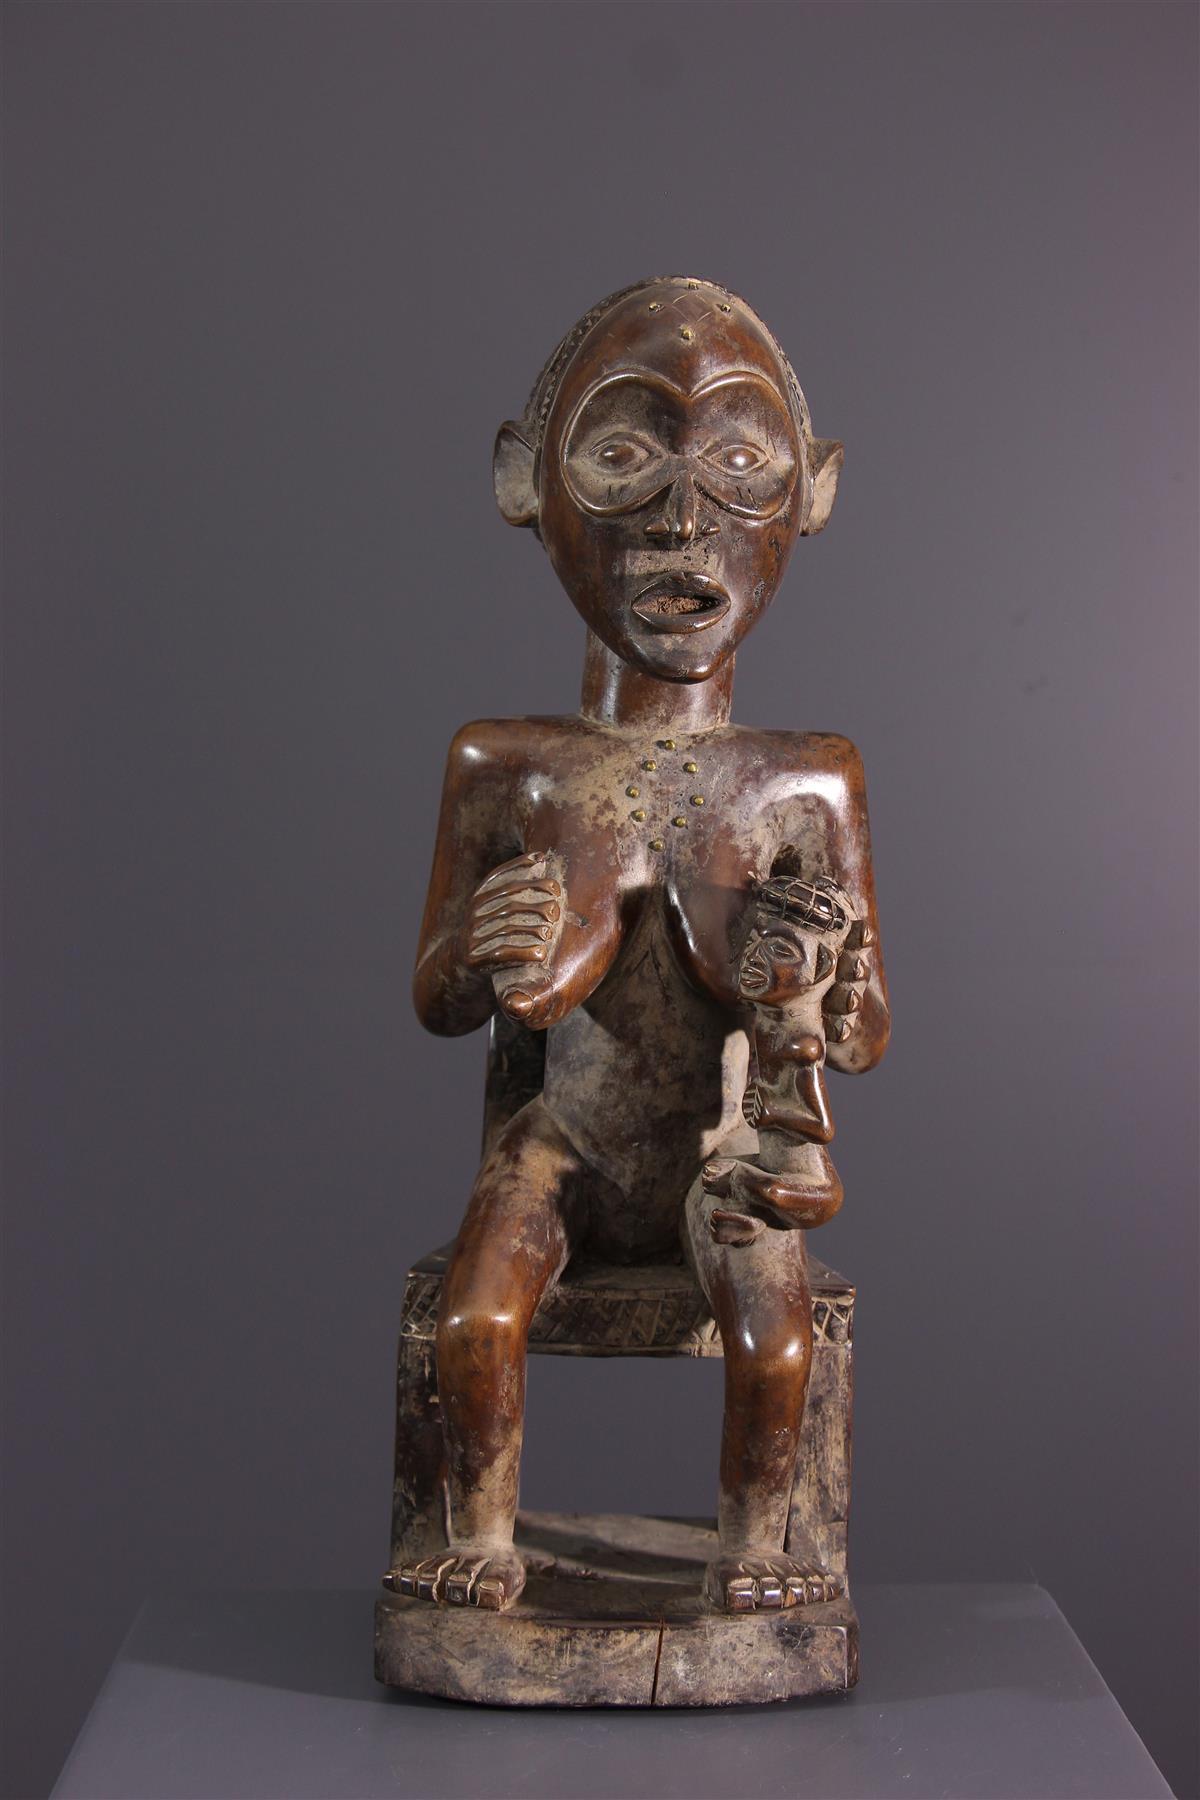 Chokwe statue - African art